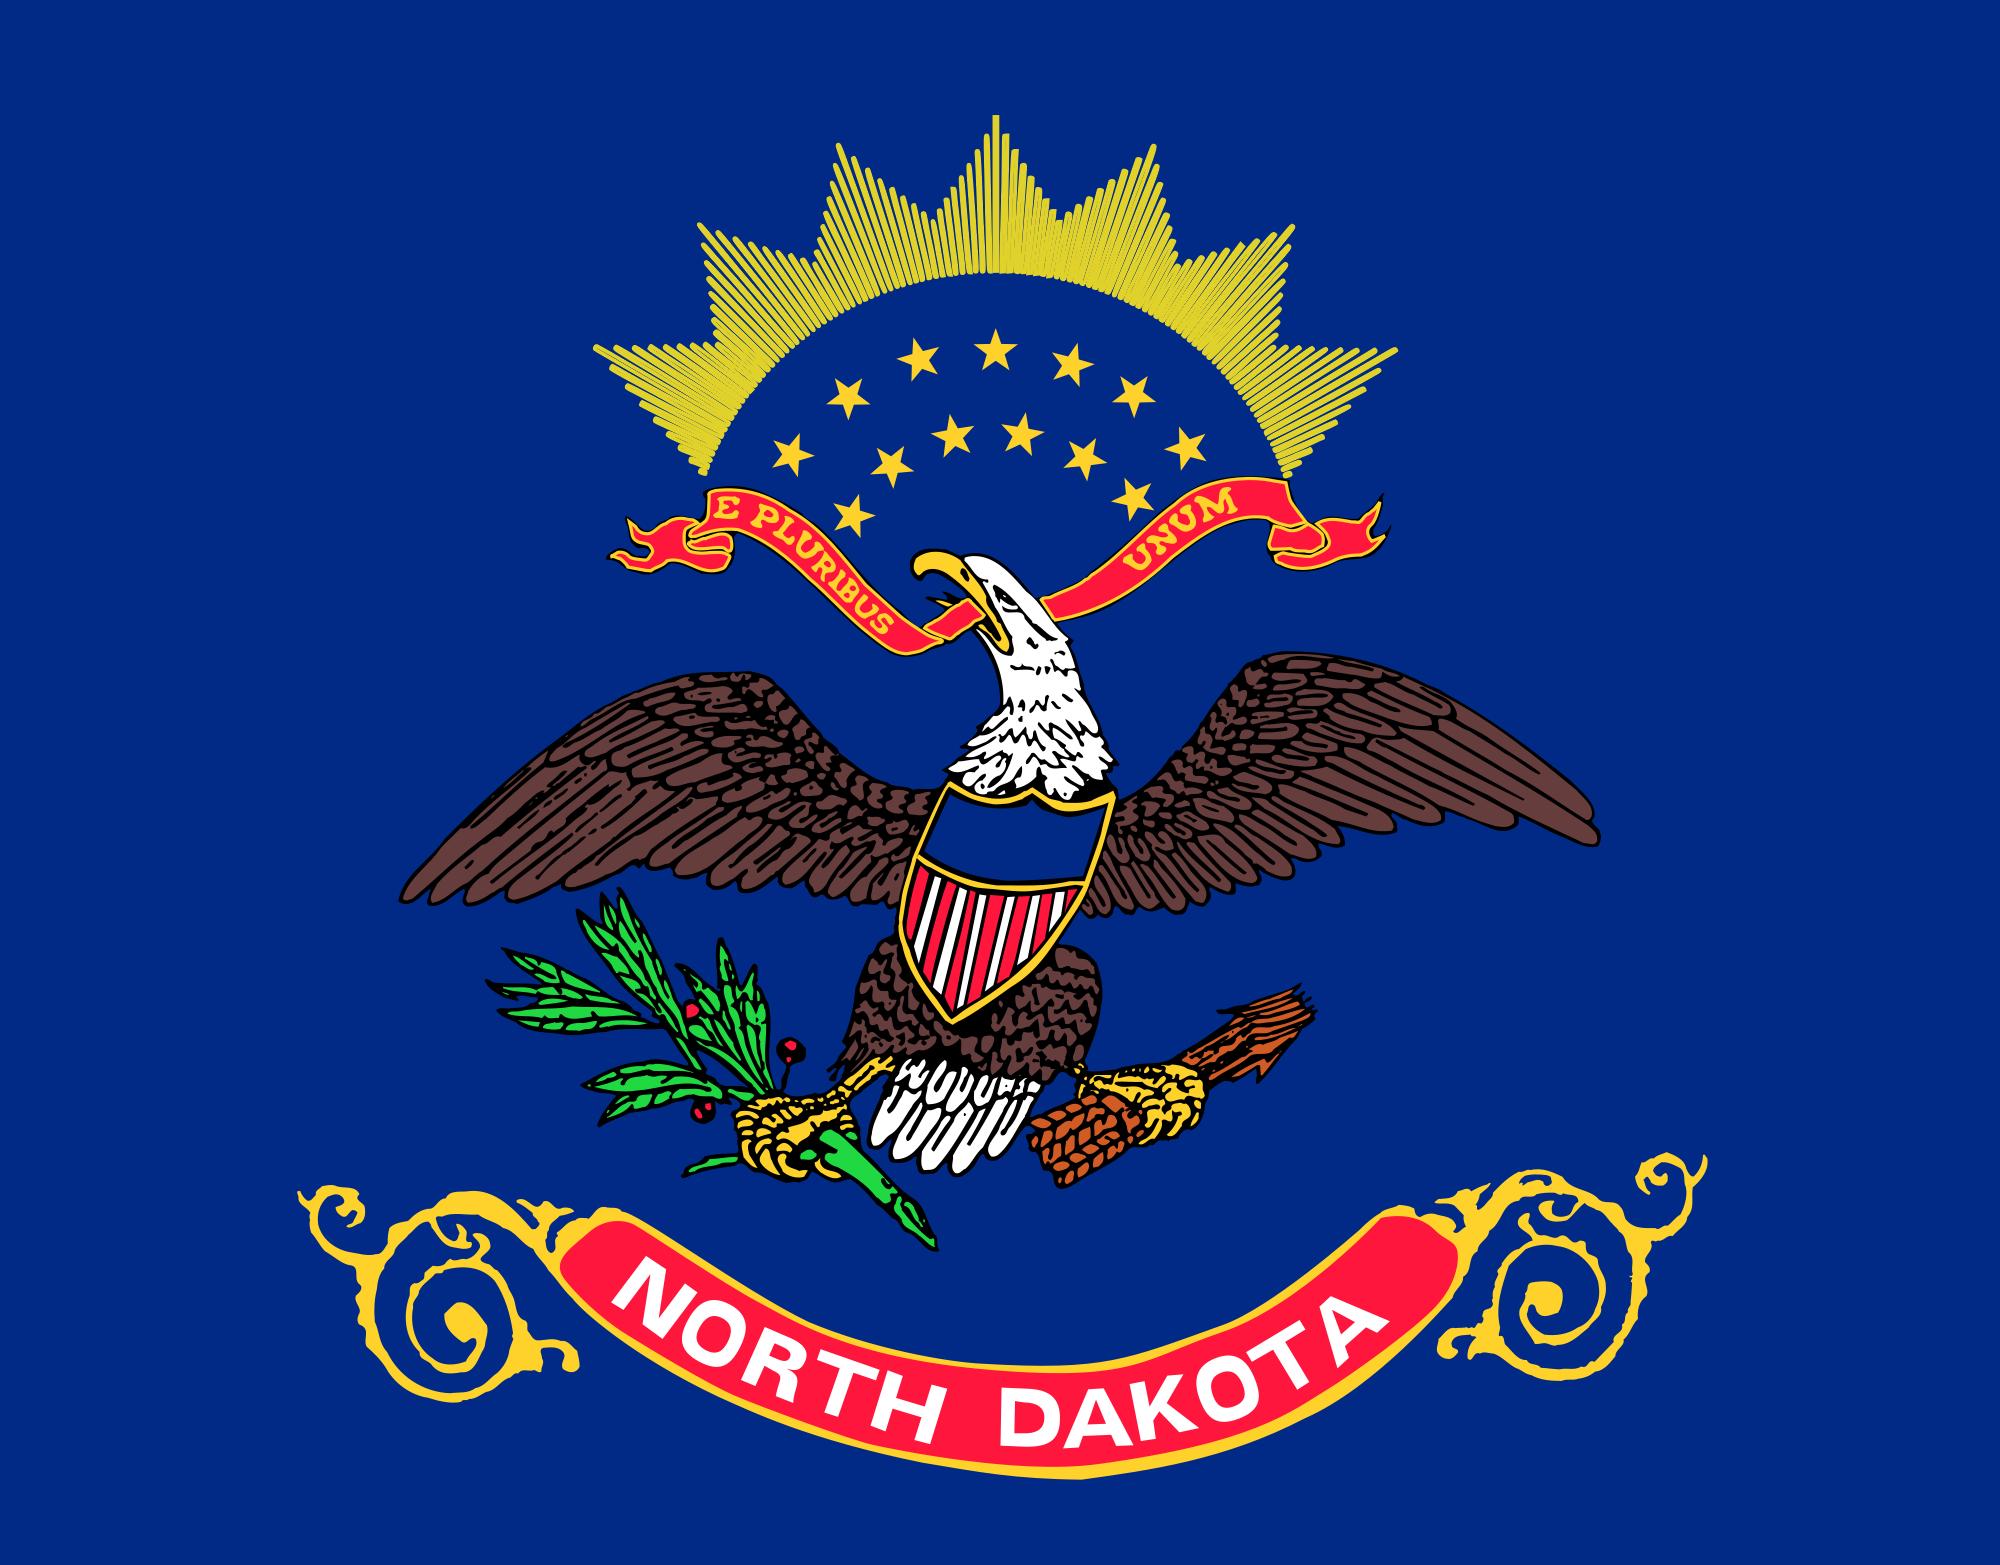 Flag of North Dakota - Wikipedia